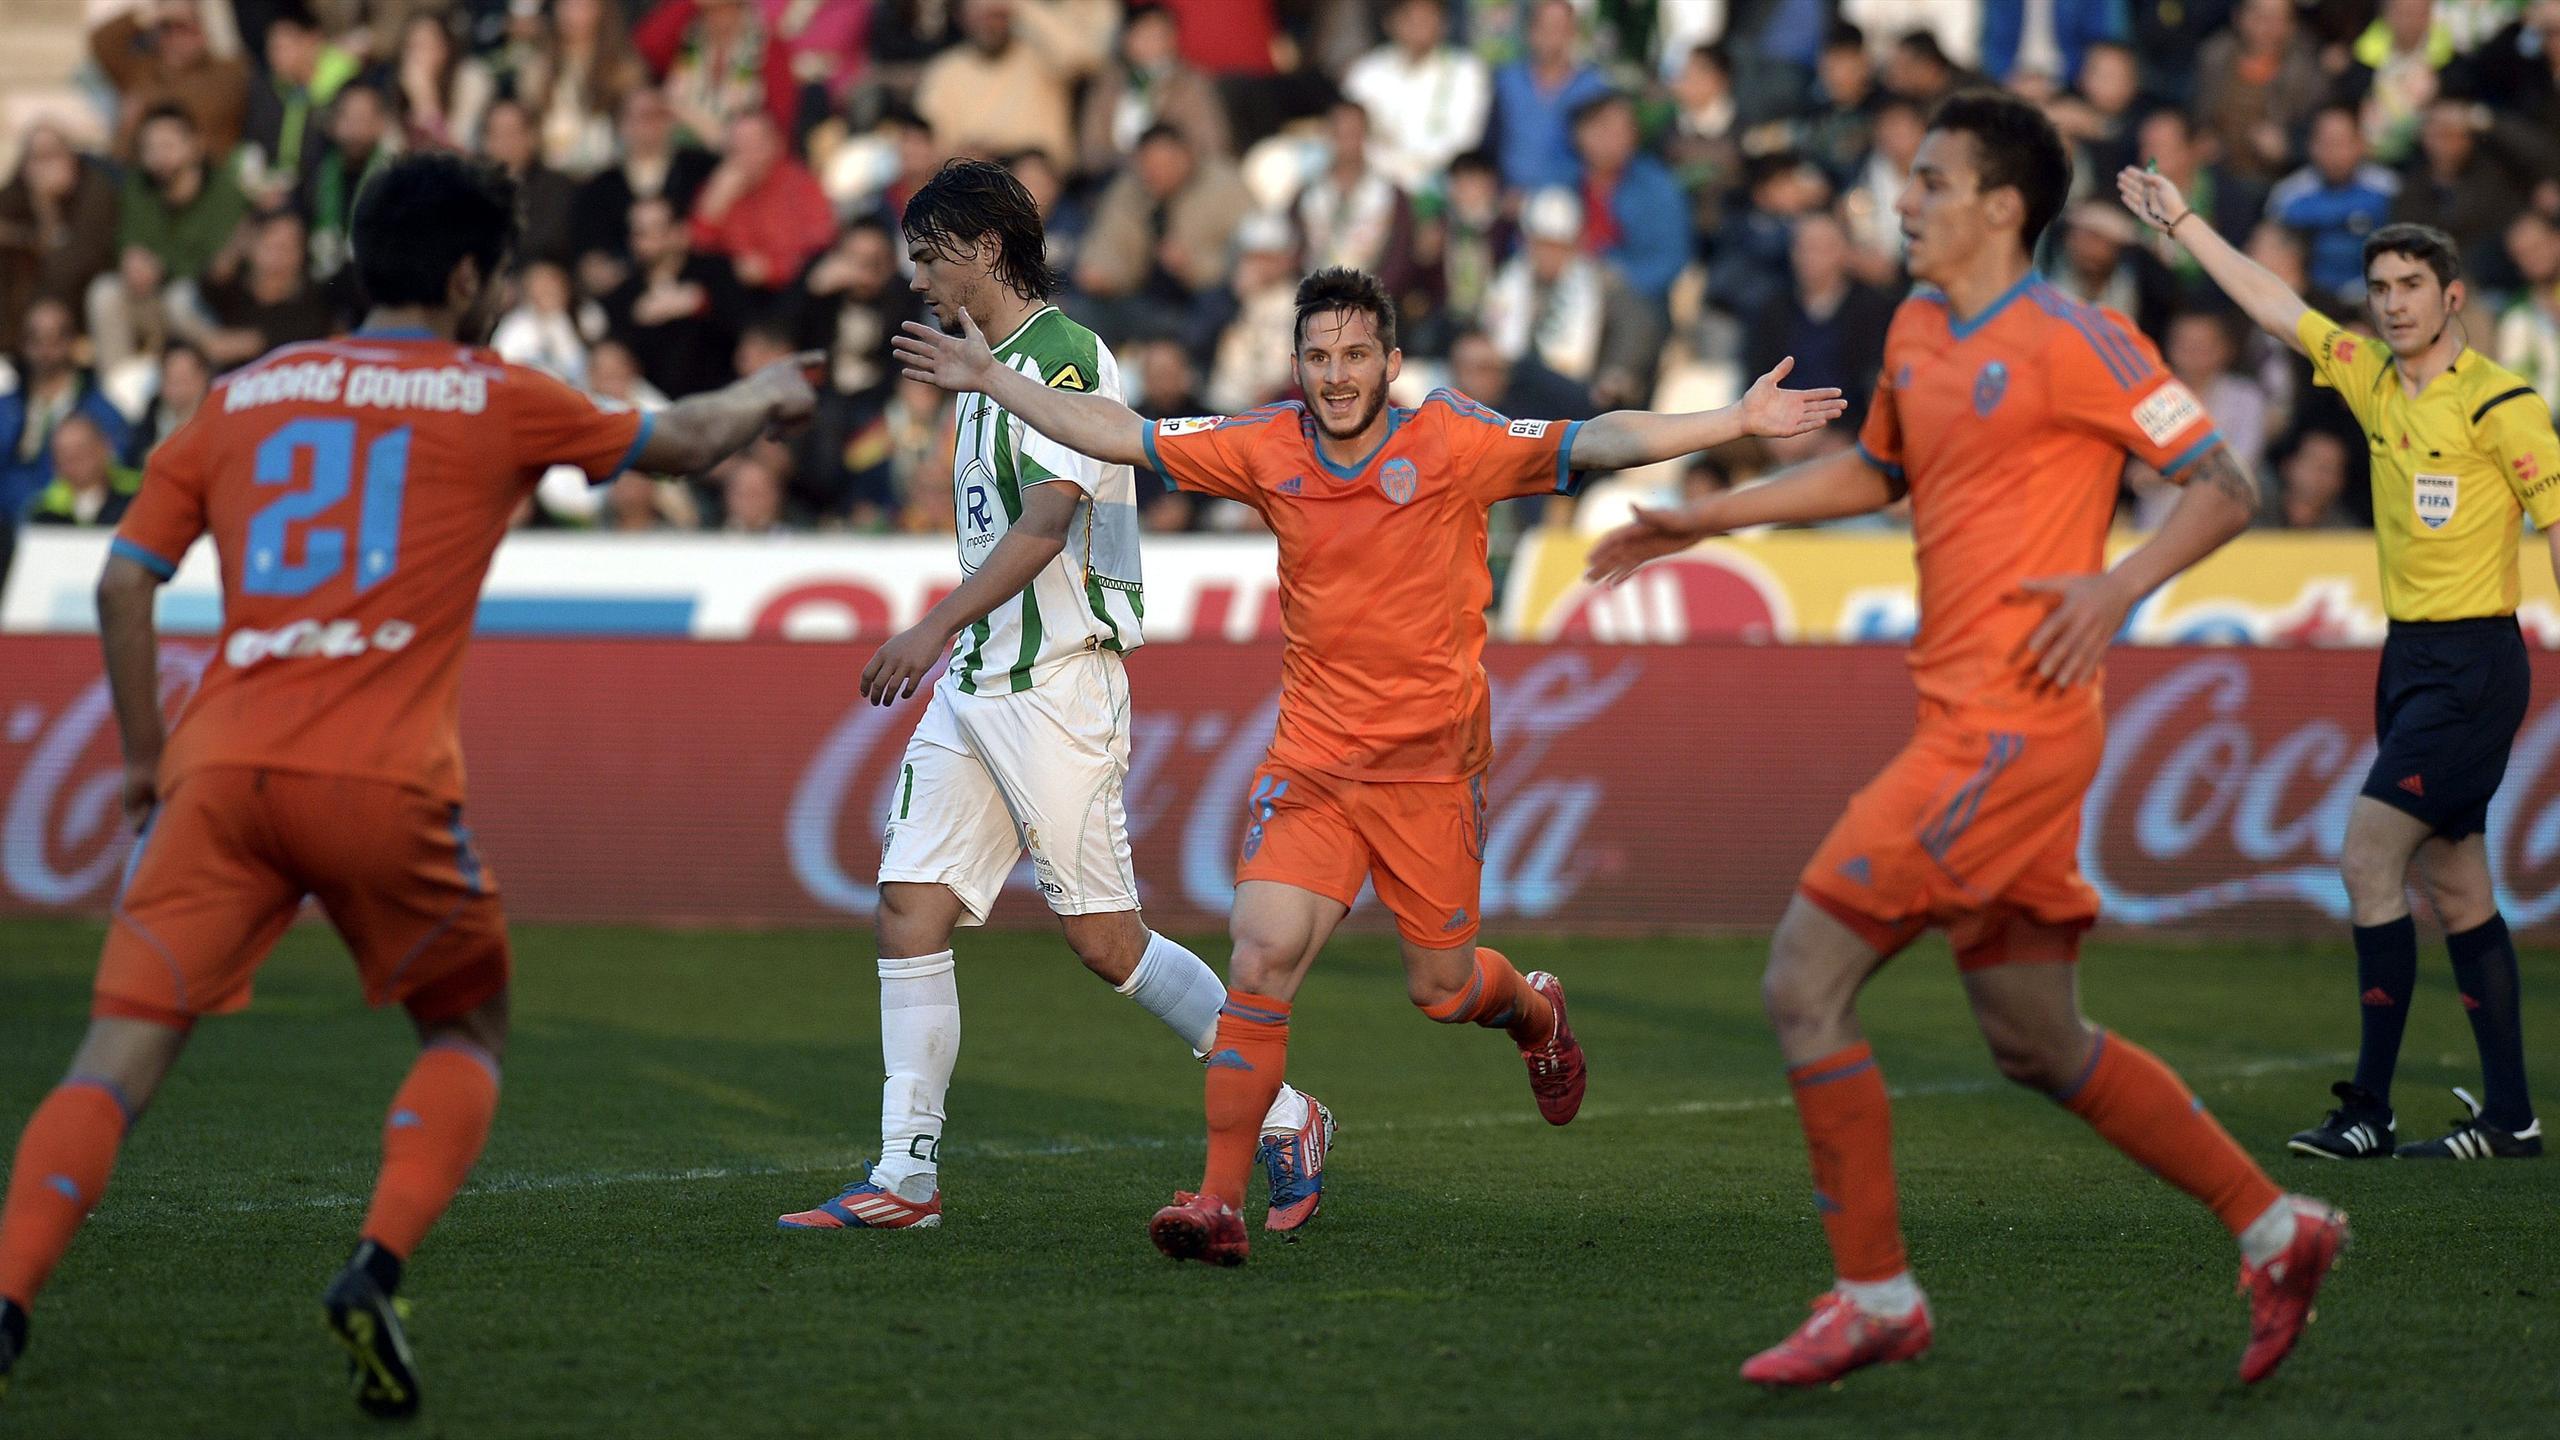 Video: Cordoba vs Valencia